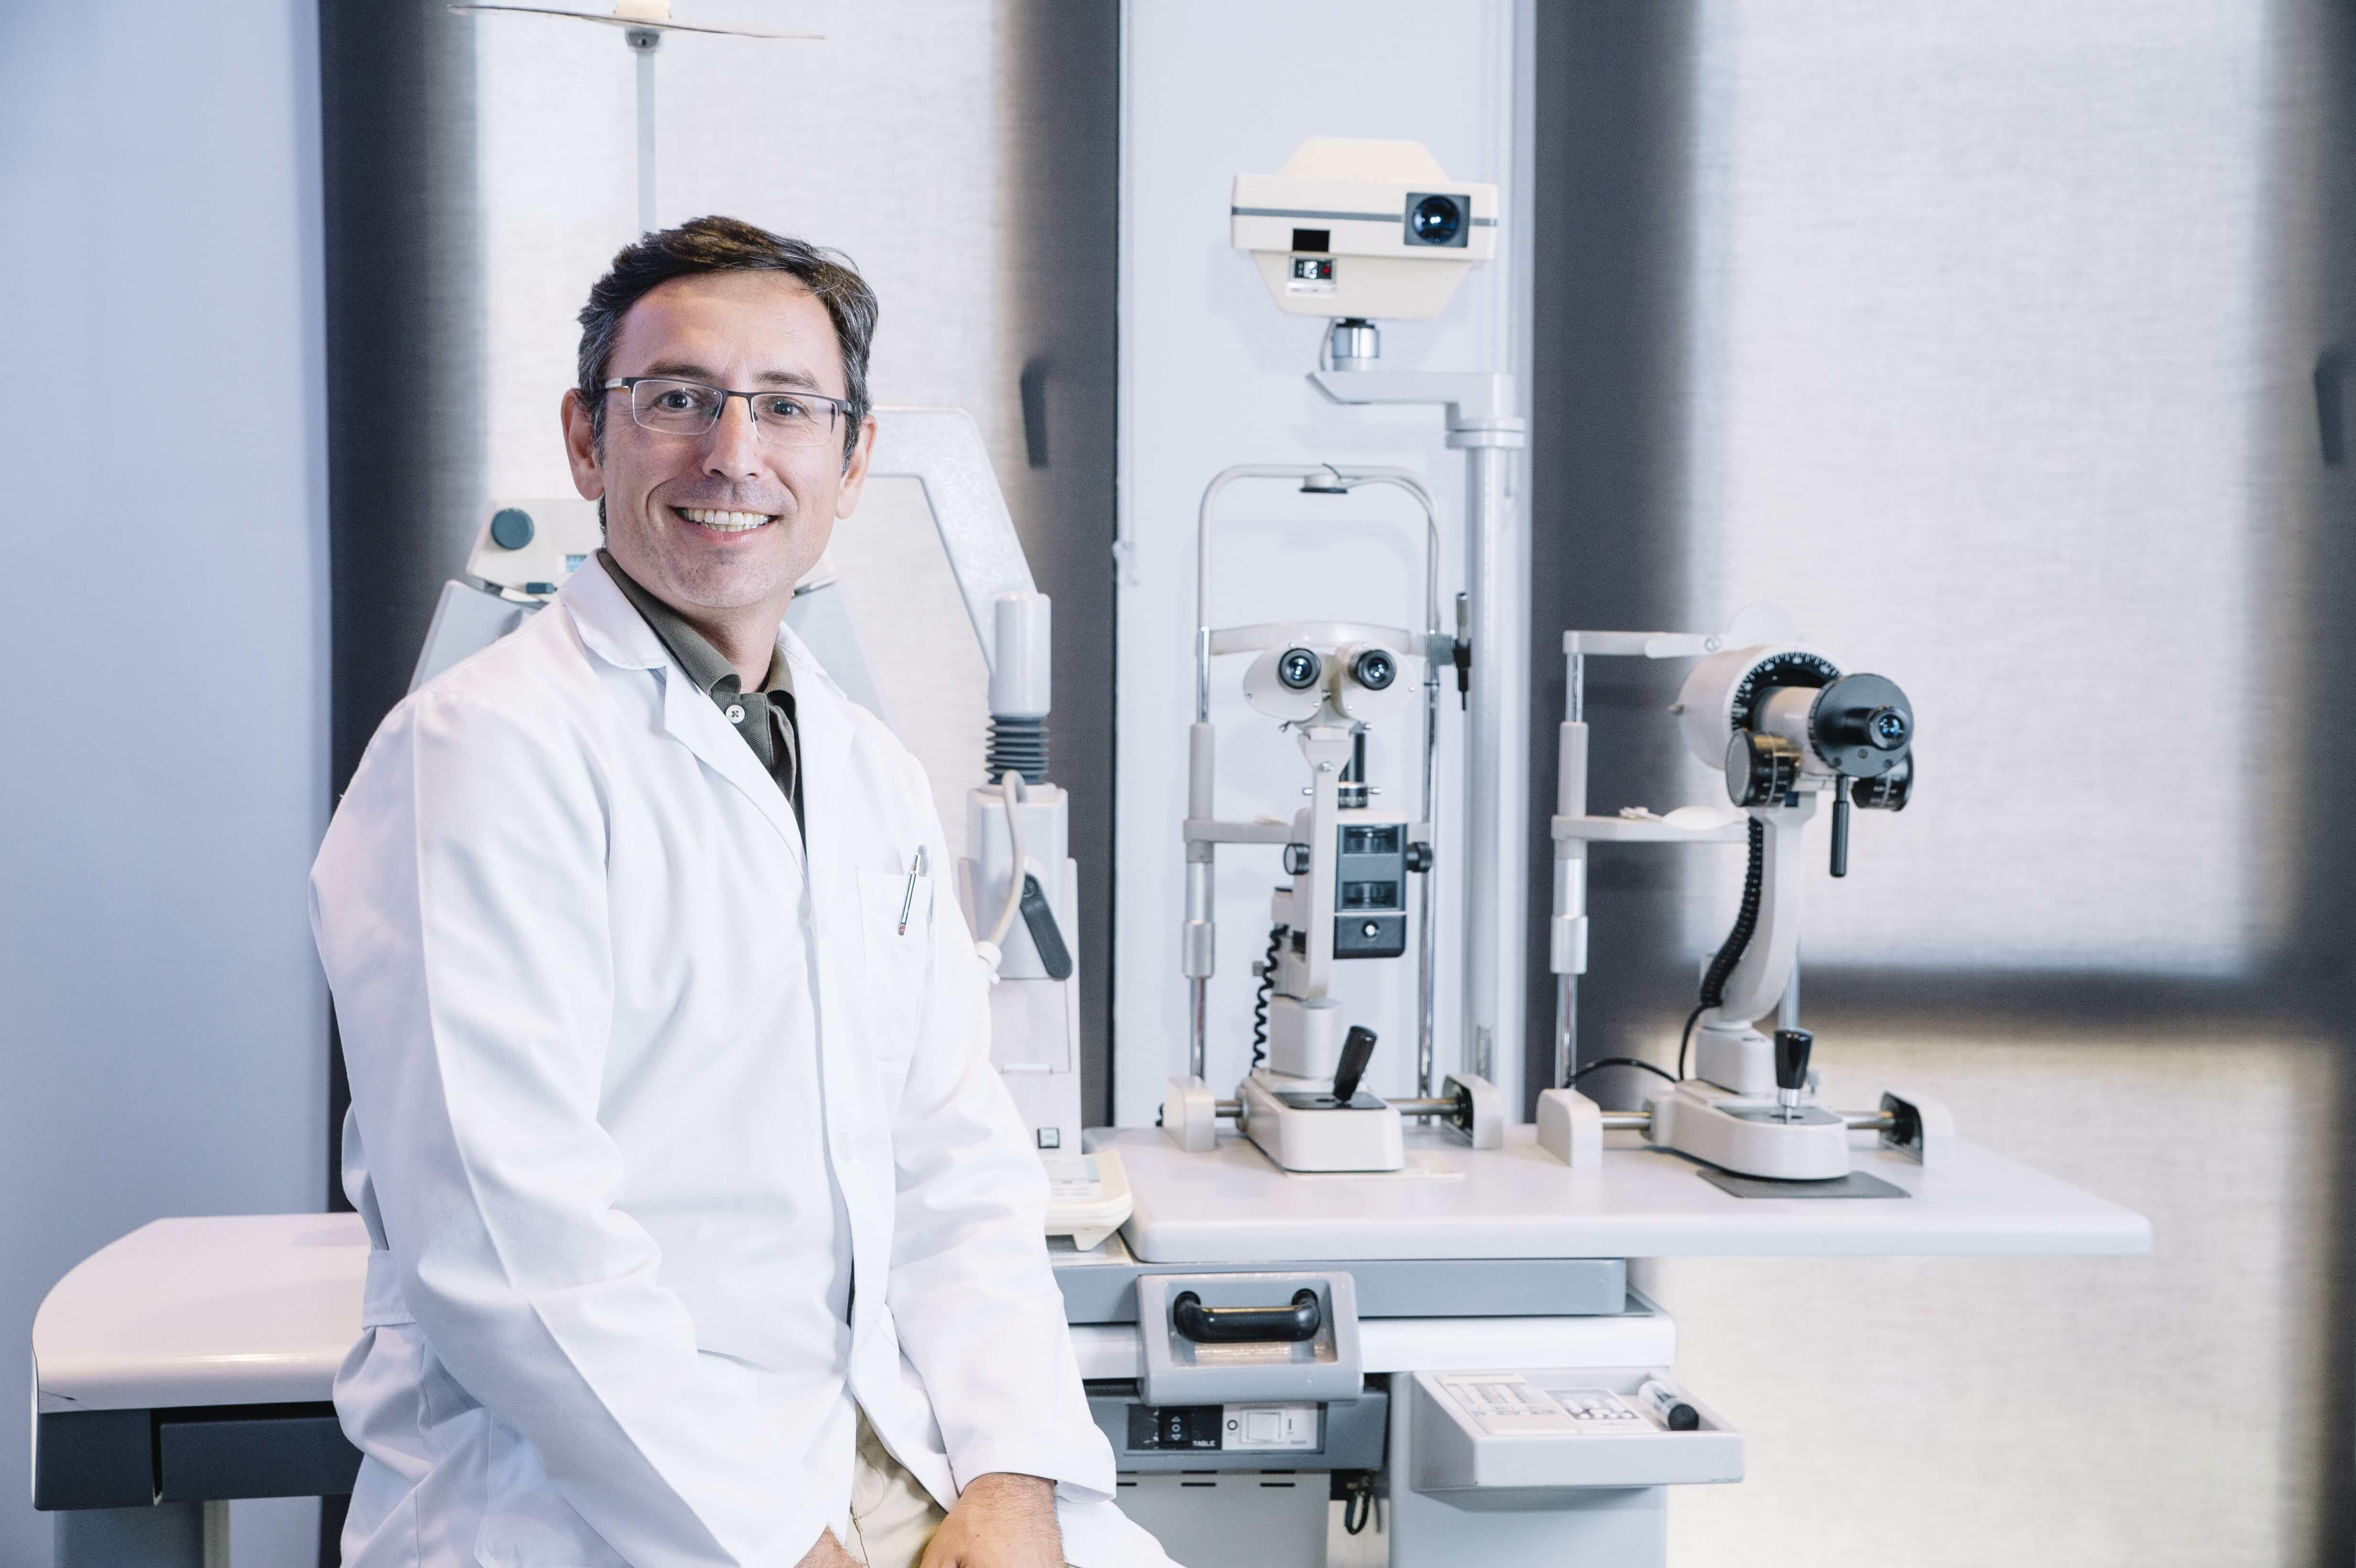 Ophthalmology telemedicine